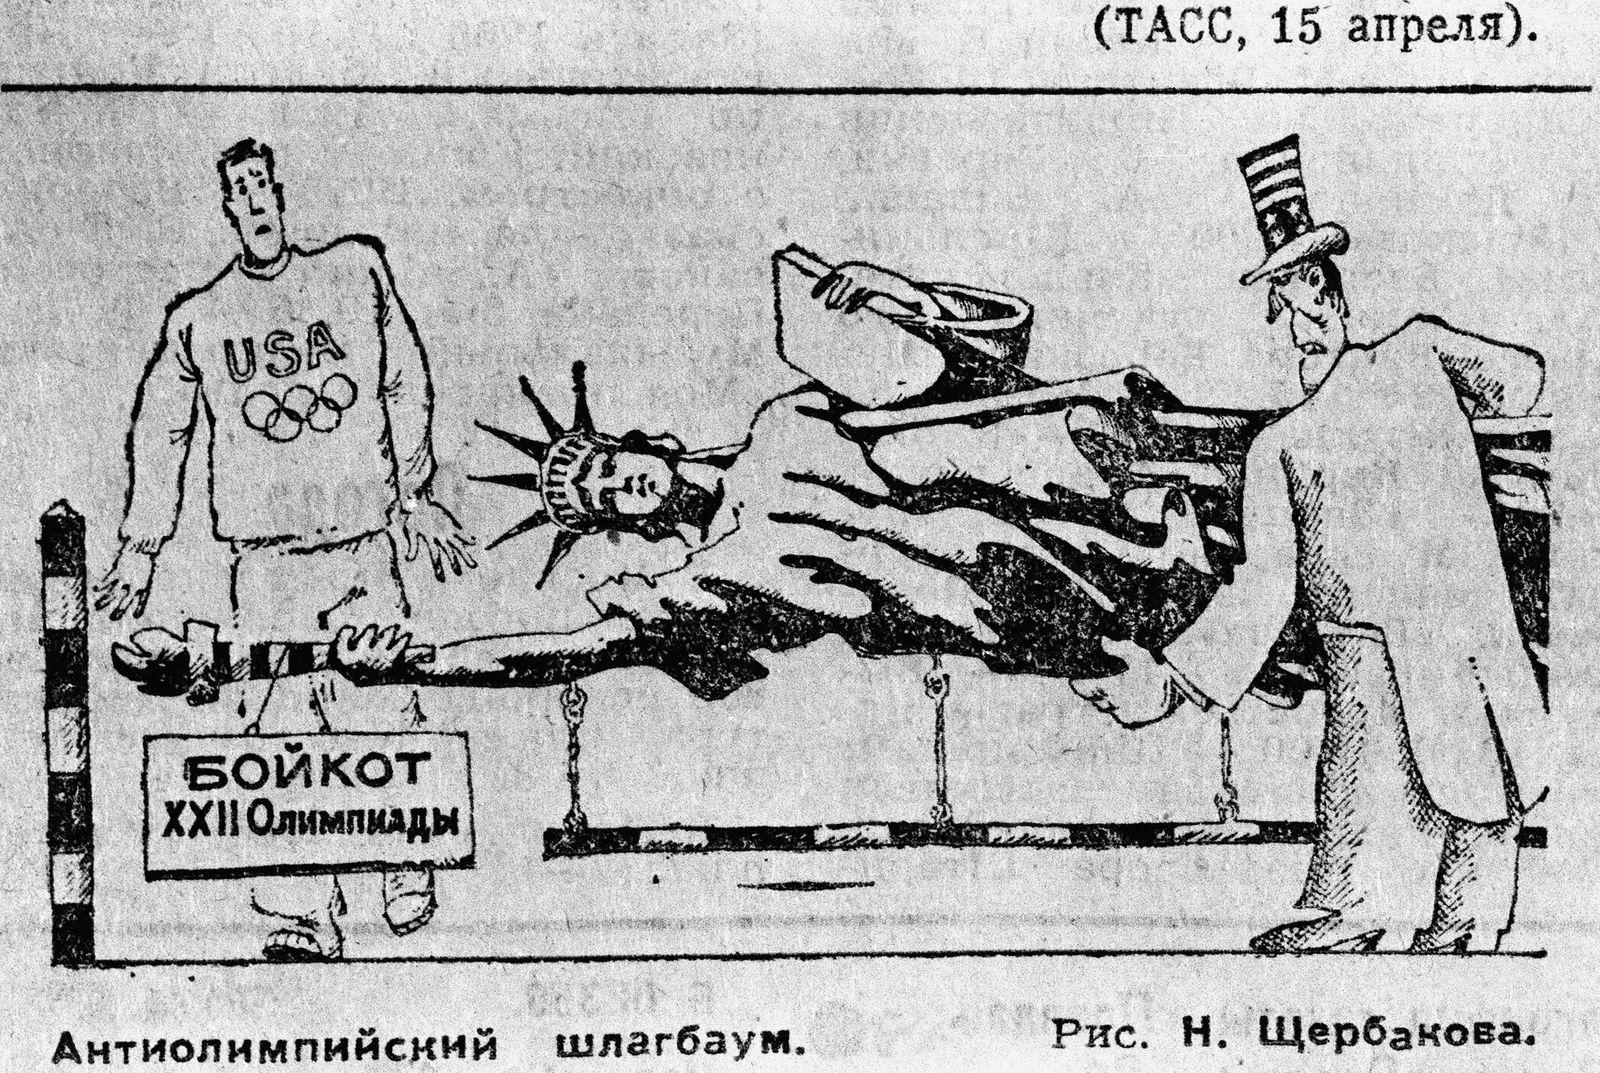 Art cartoon Moscow Olympics 1980